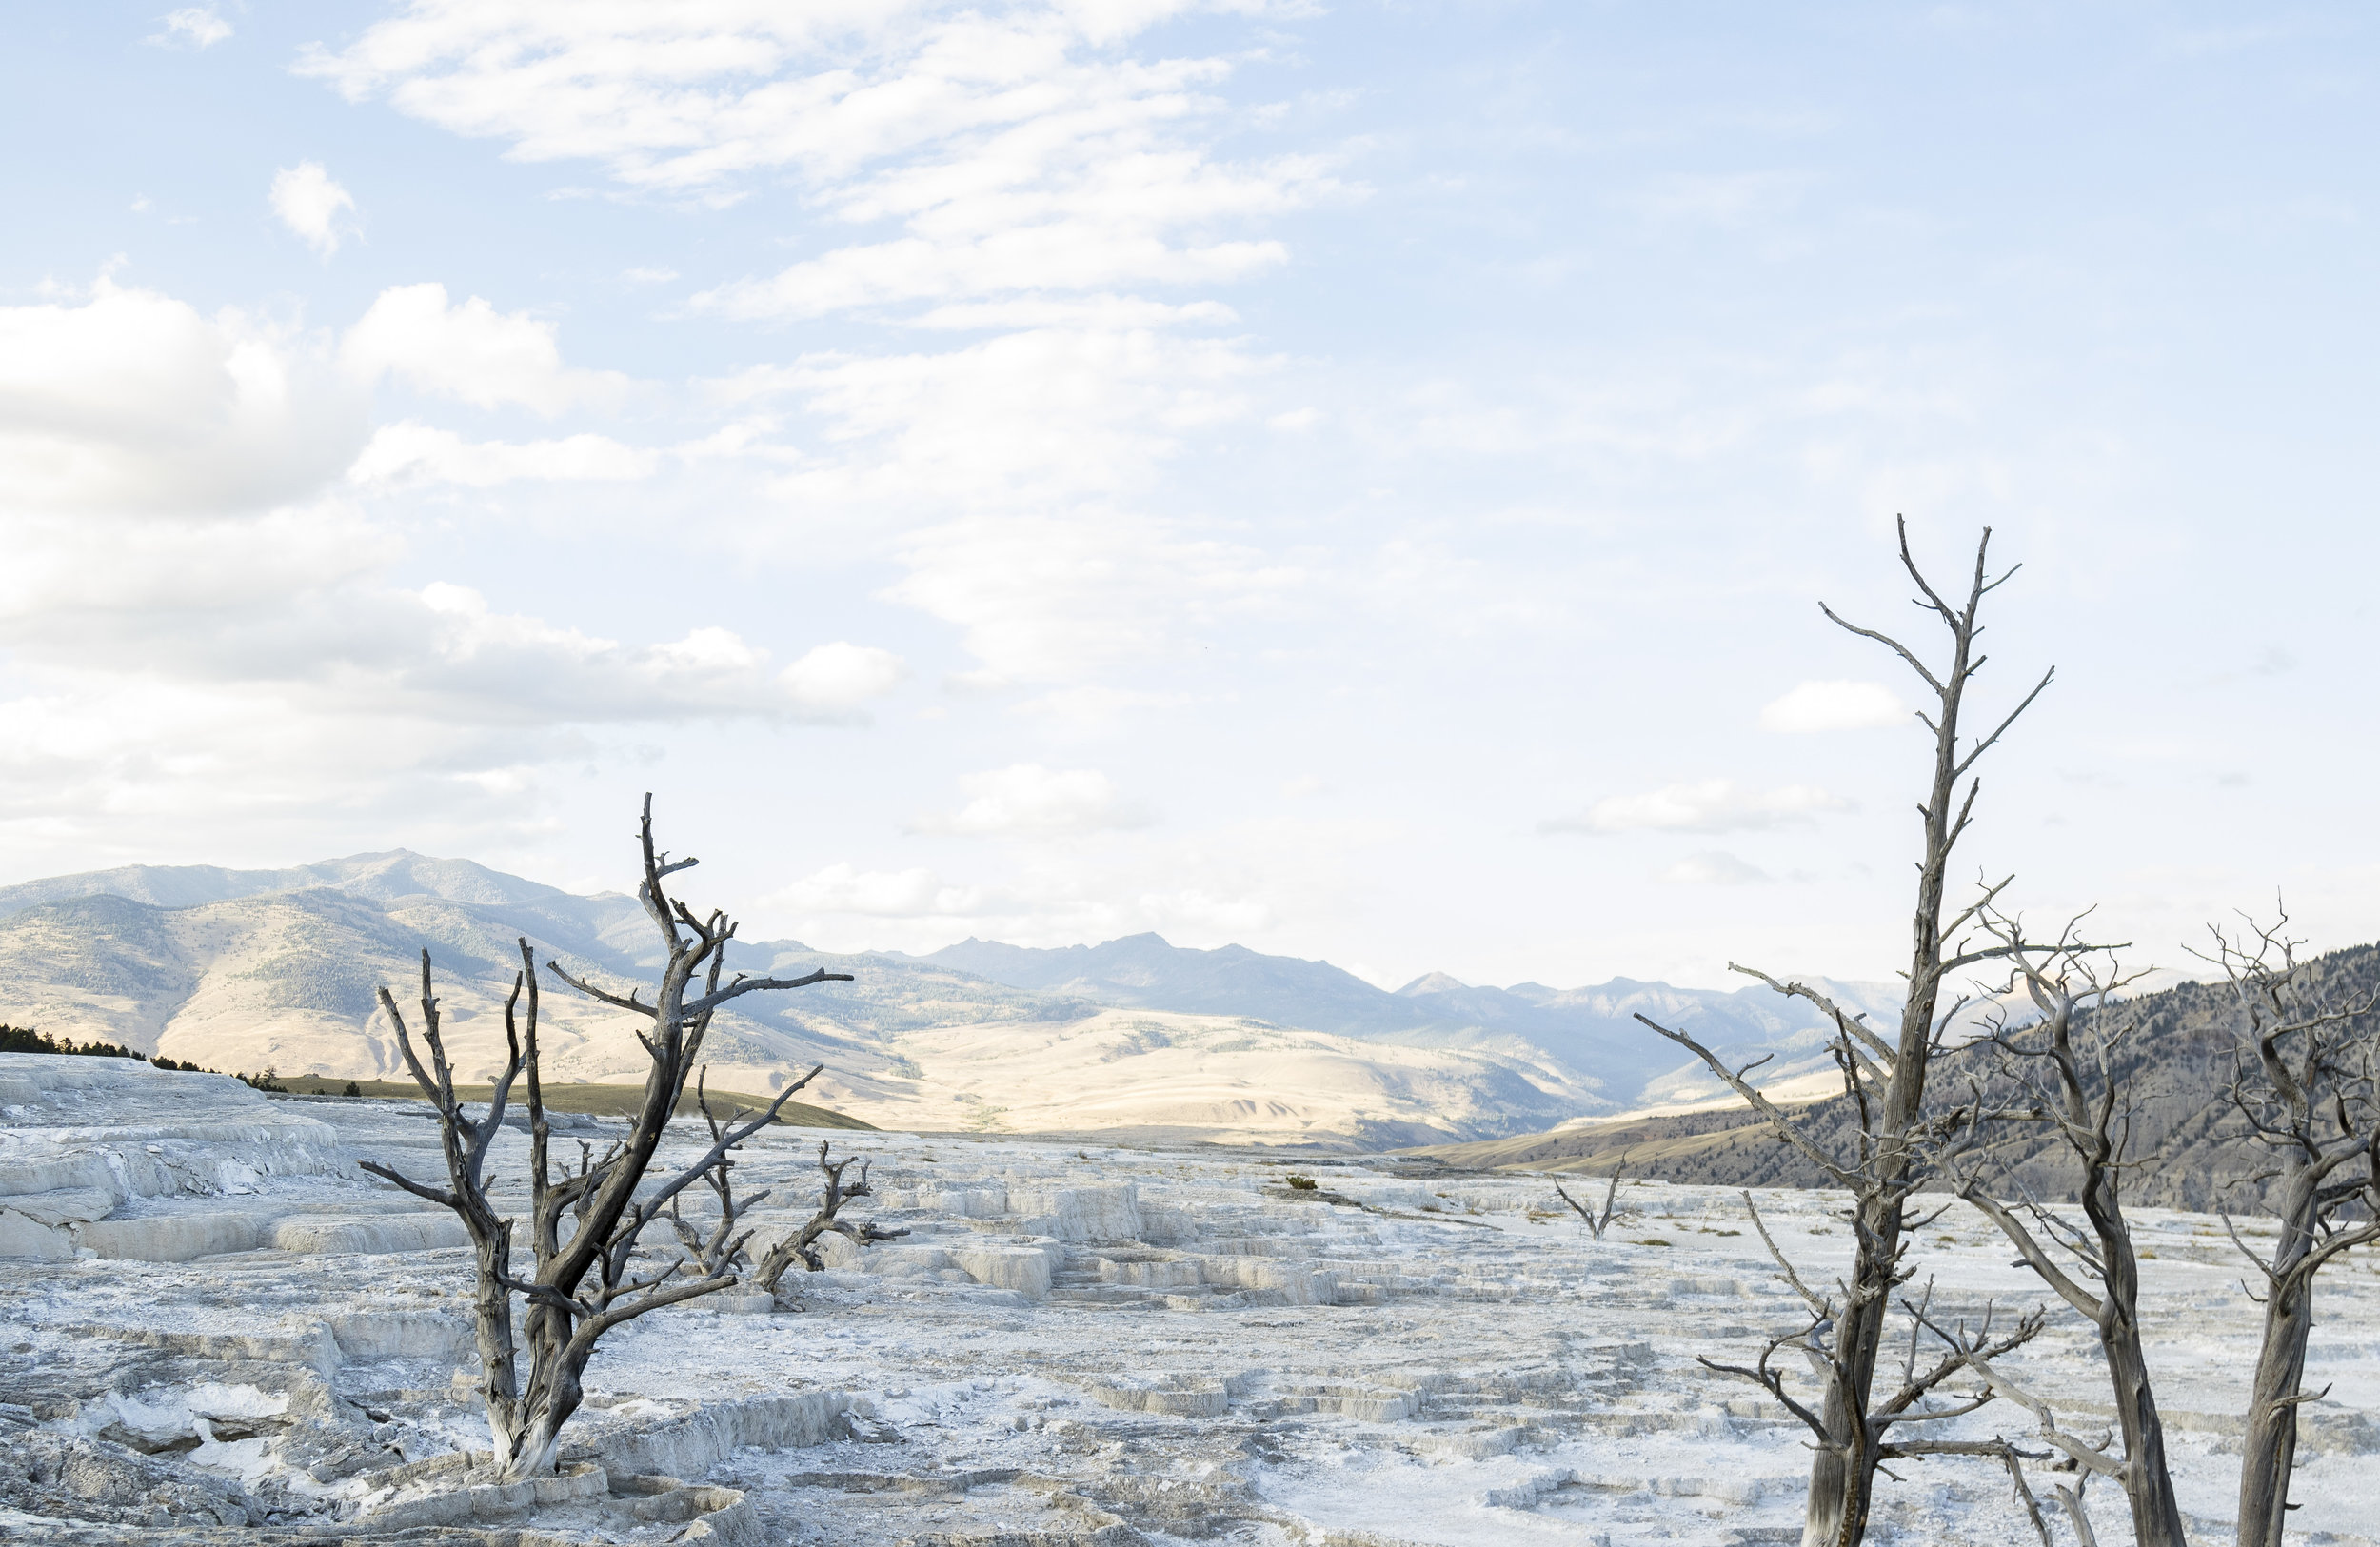 Mountain Landscape in Montana